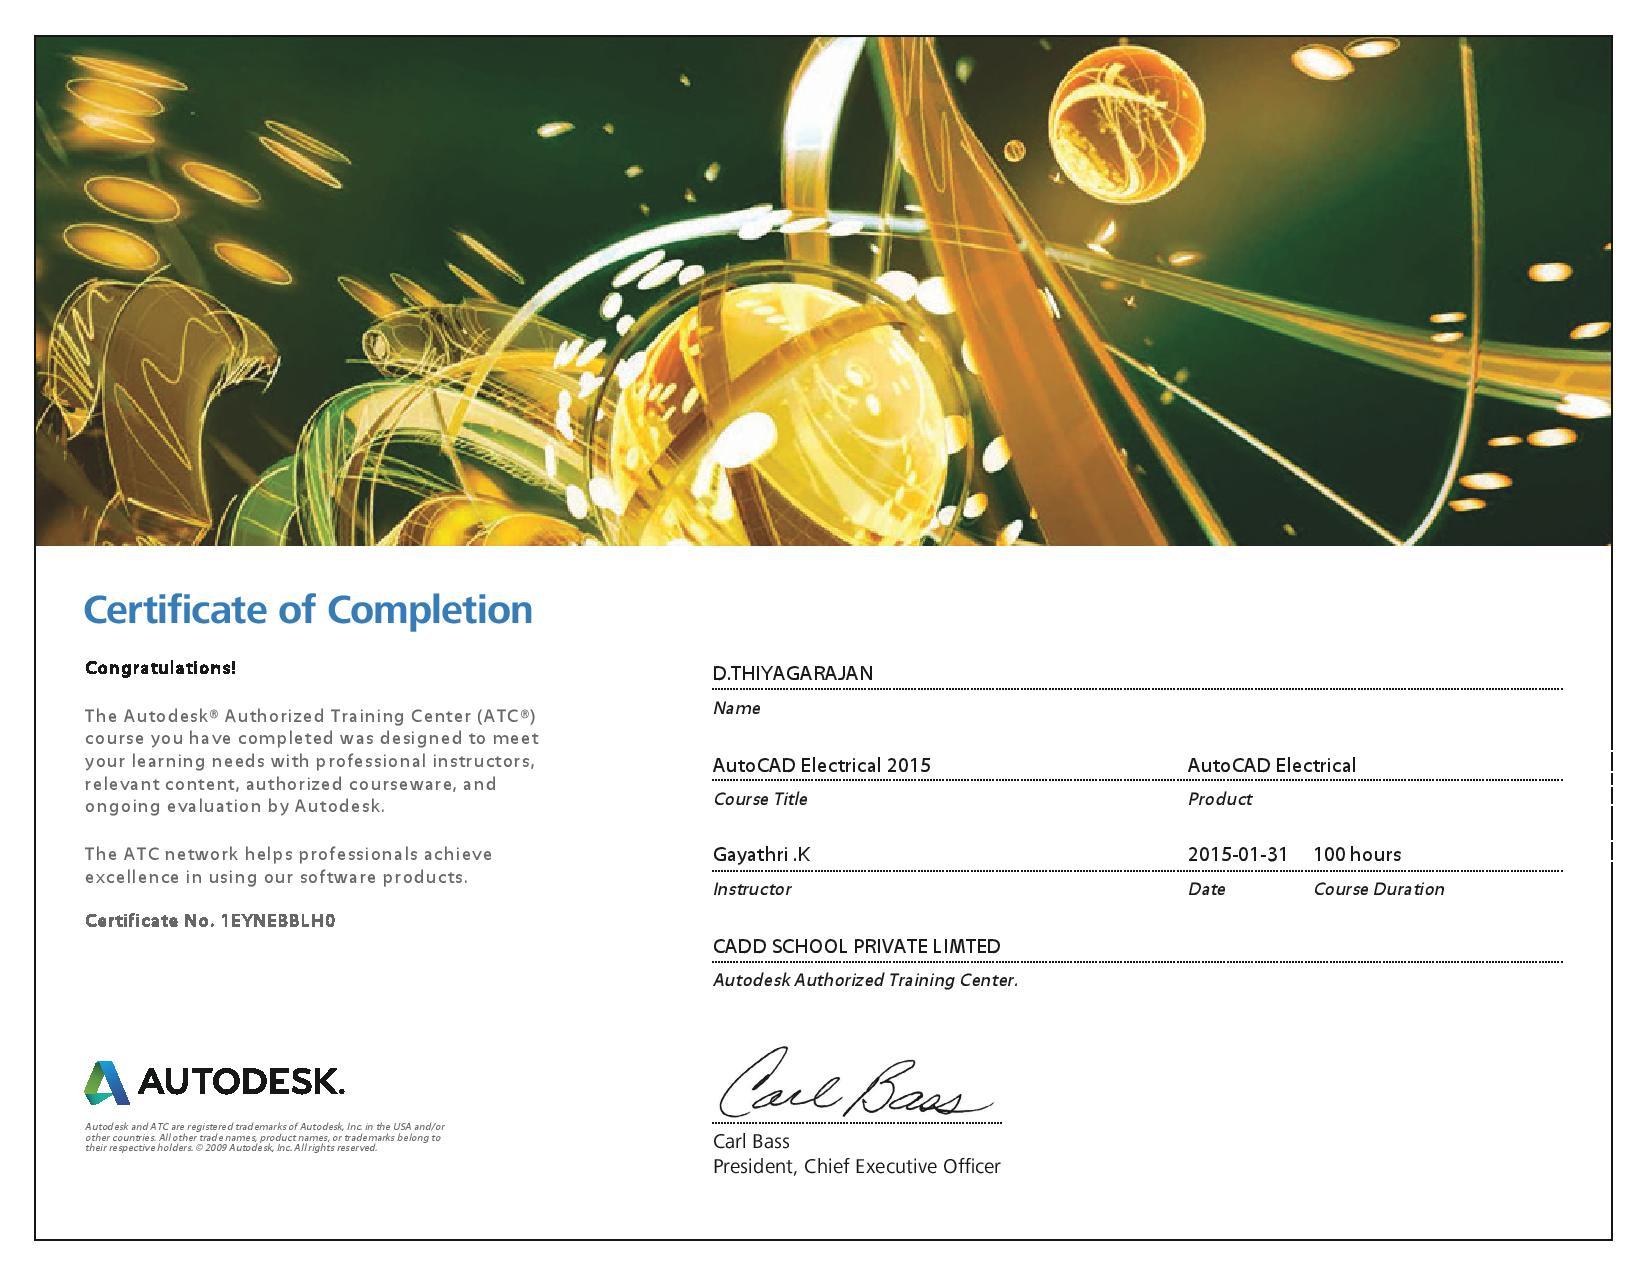 Cadd training center avadi best cadd training in avadi international certificates autodesk course completion xflitez Gallery